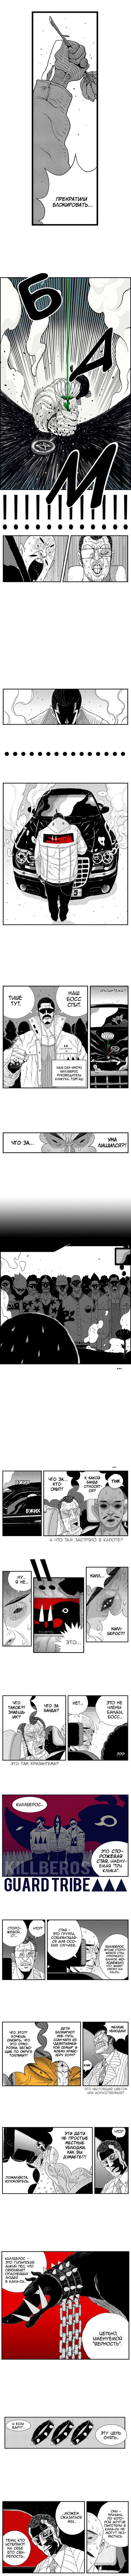 https://r1.ninemanga.com/comics/pic2/61/23549/315808/1483744239224.jpg Page 2